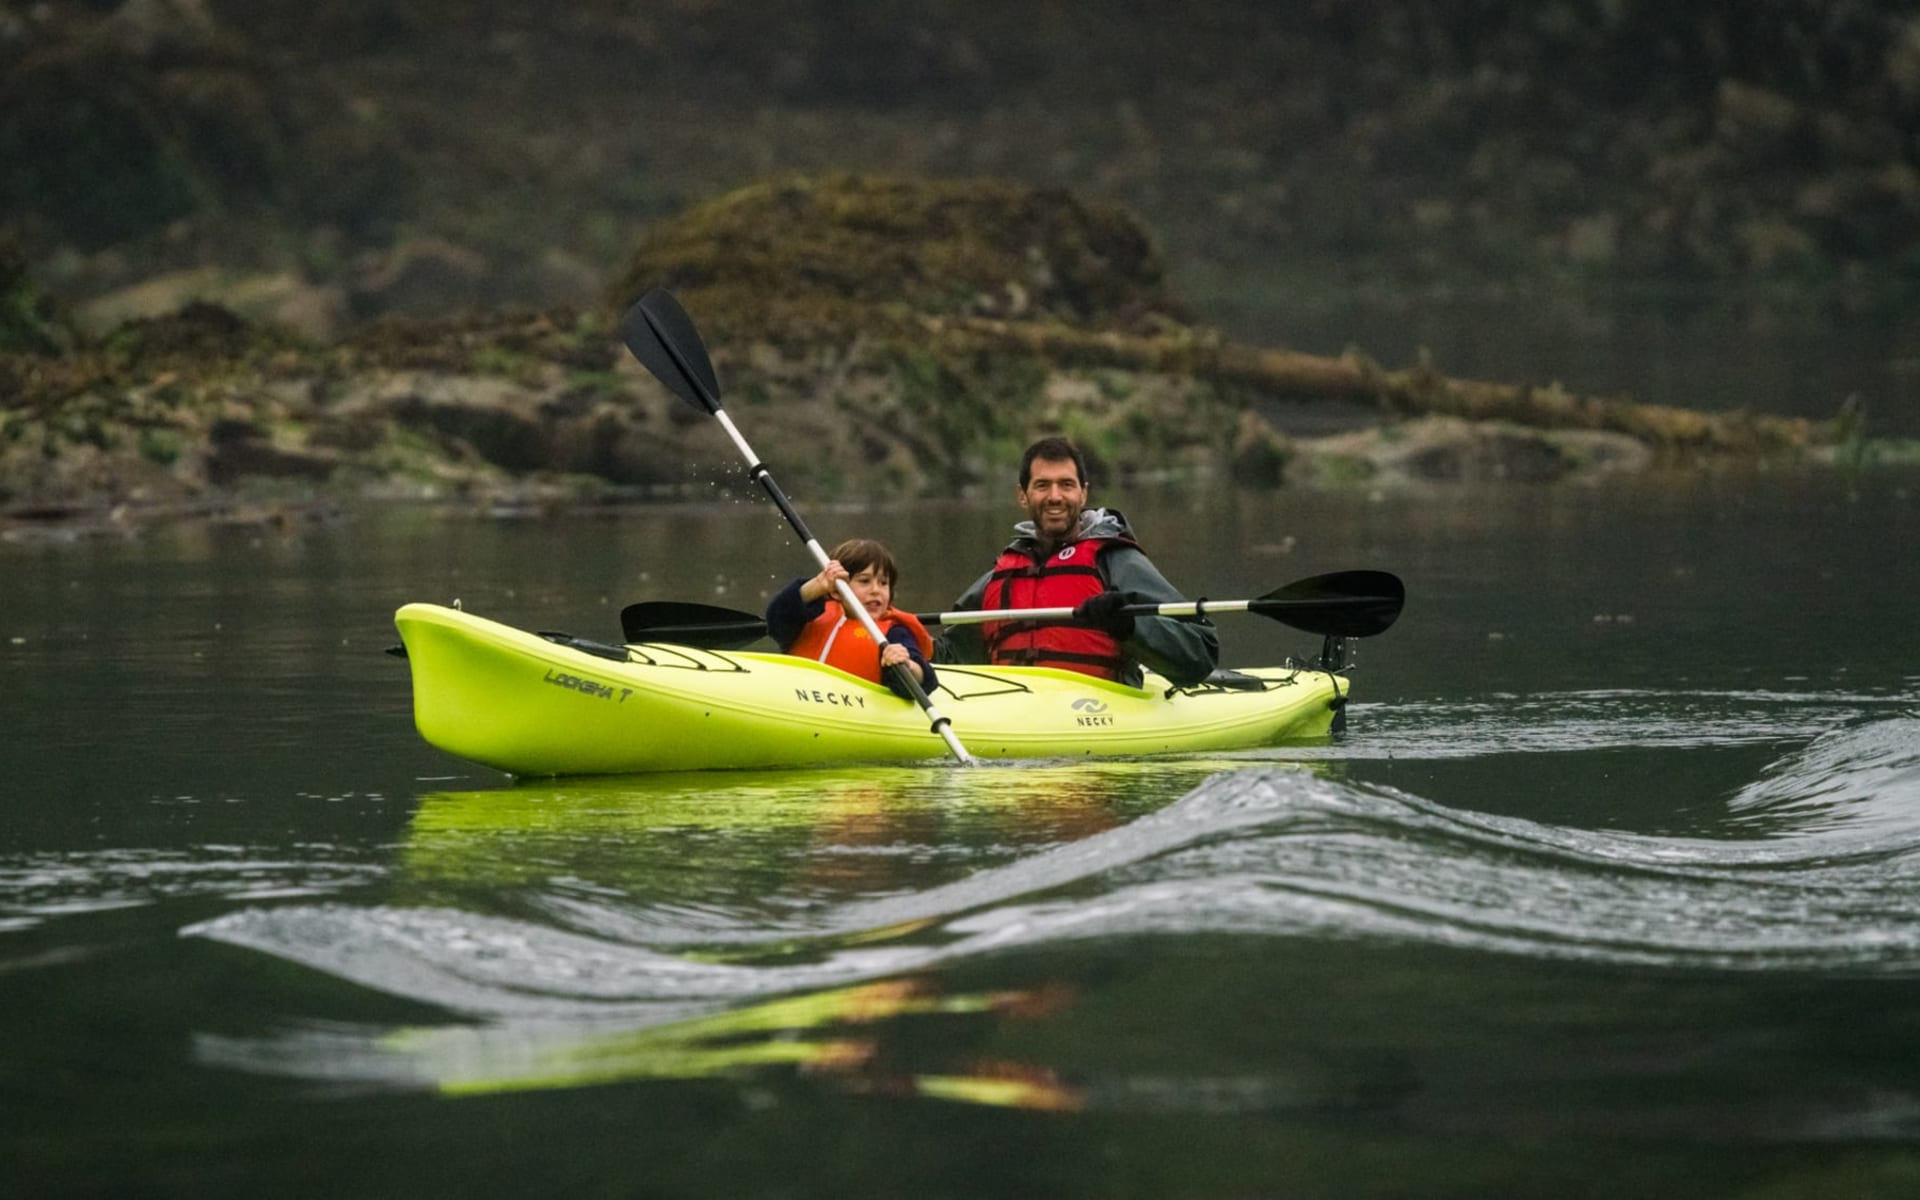 Bärenbeobachtung Farewell Lodge ab Vancouver Island: activities: Farewell Lodge - Kayaking